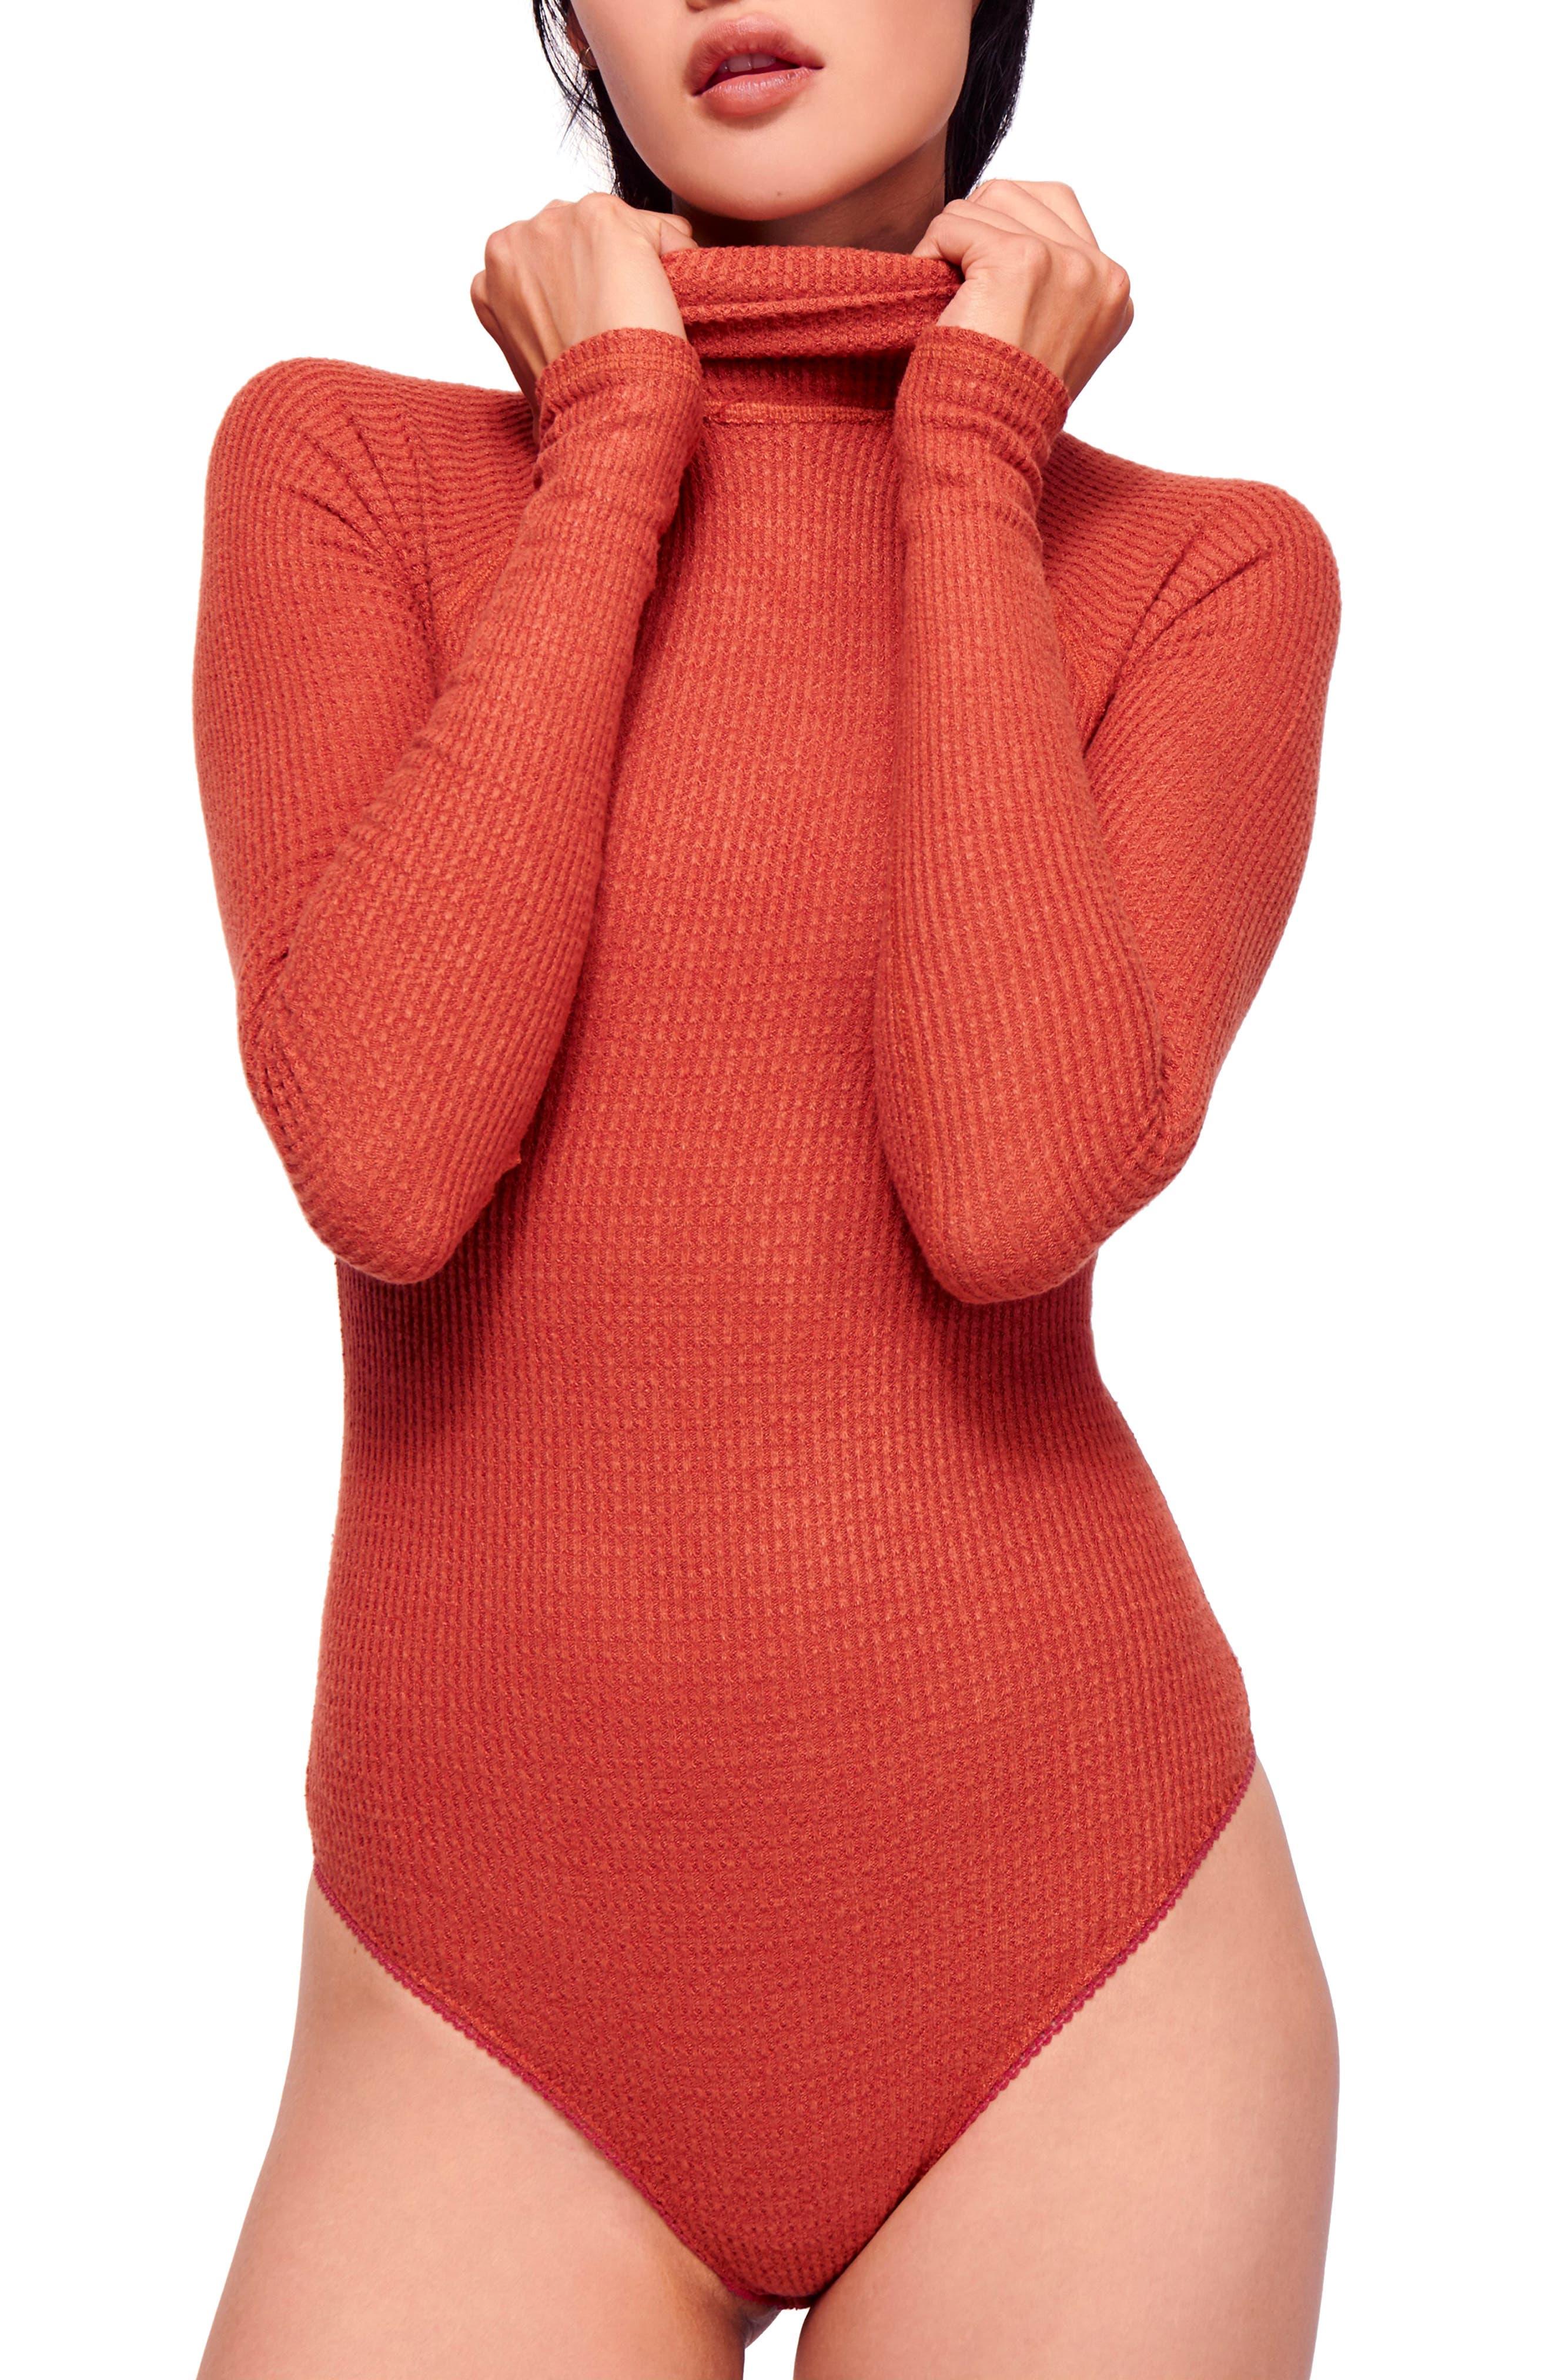 All You Want Bodysuit,                             Main thumbnail 1, color,                             COPPER